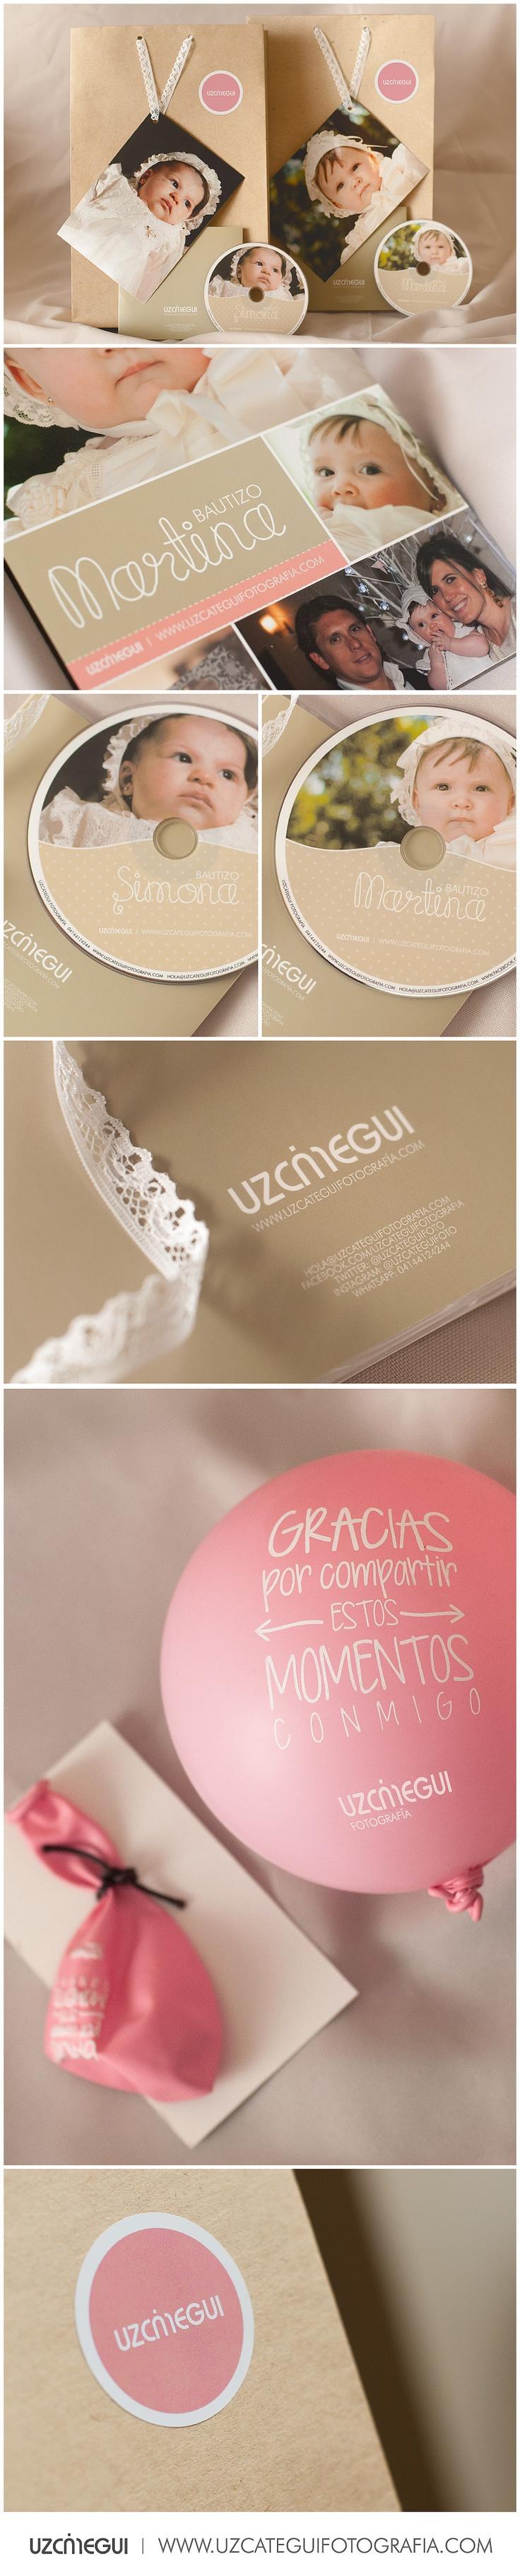 Empaque para bautizo Simona y su primita Martina @uzcateguifoto #branding…